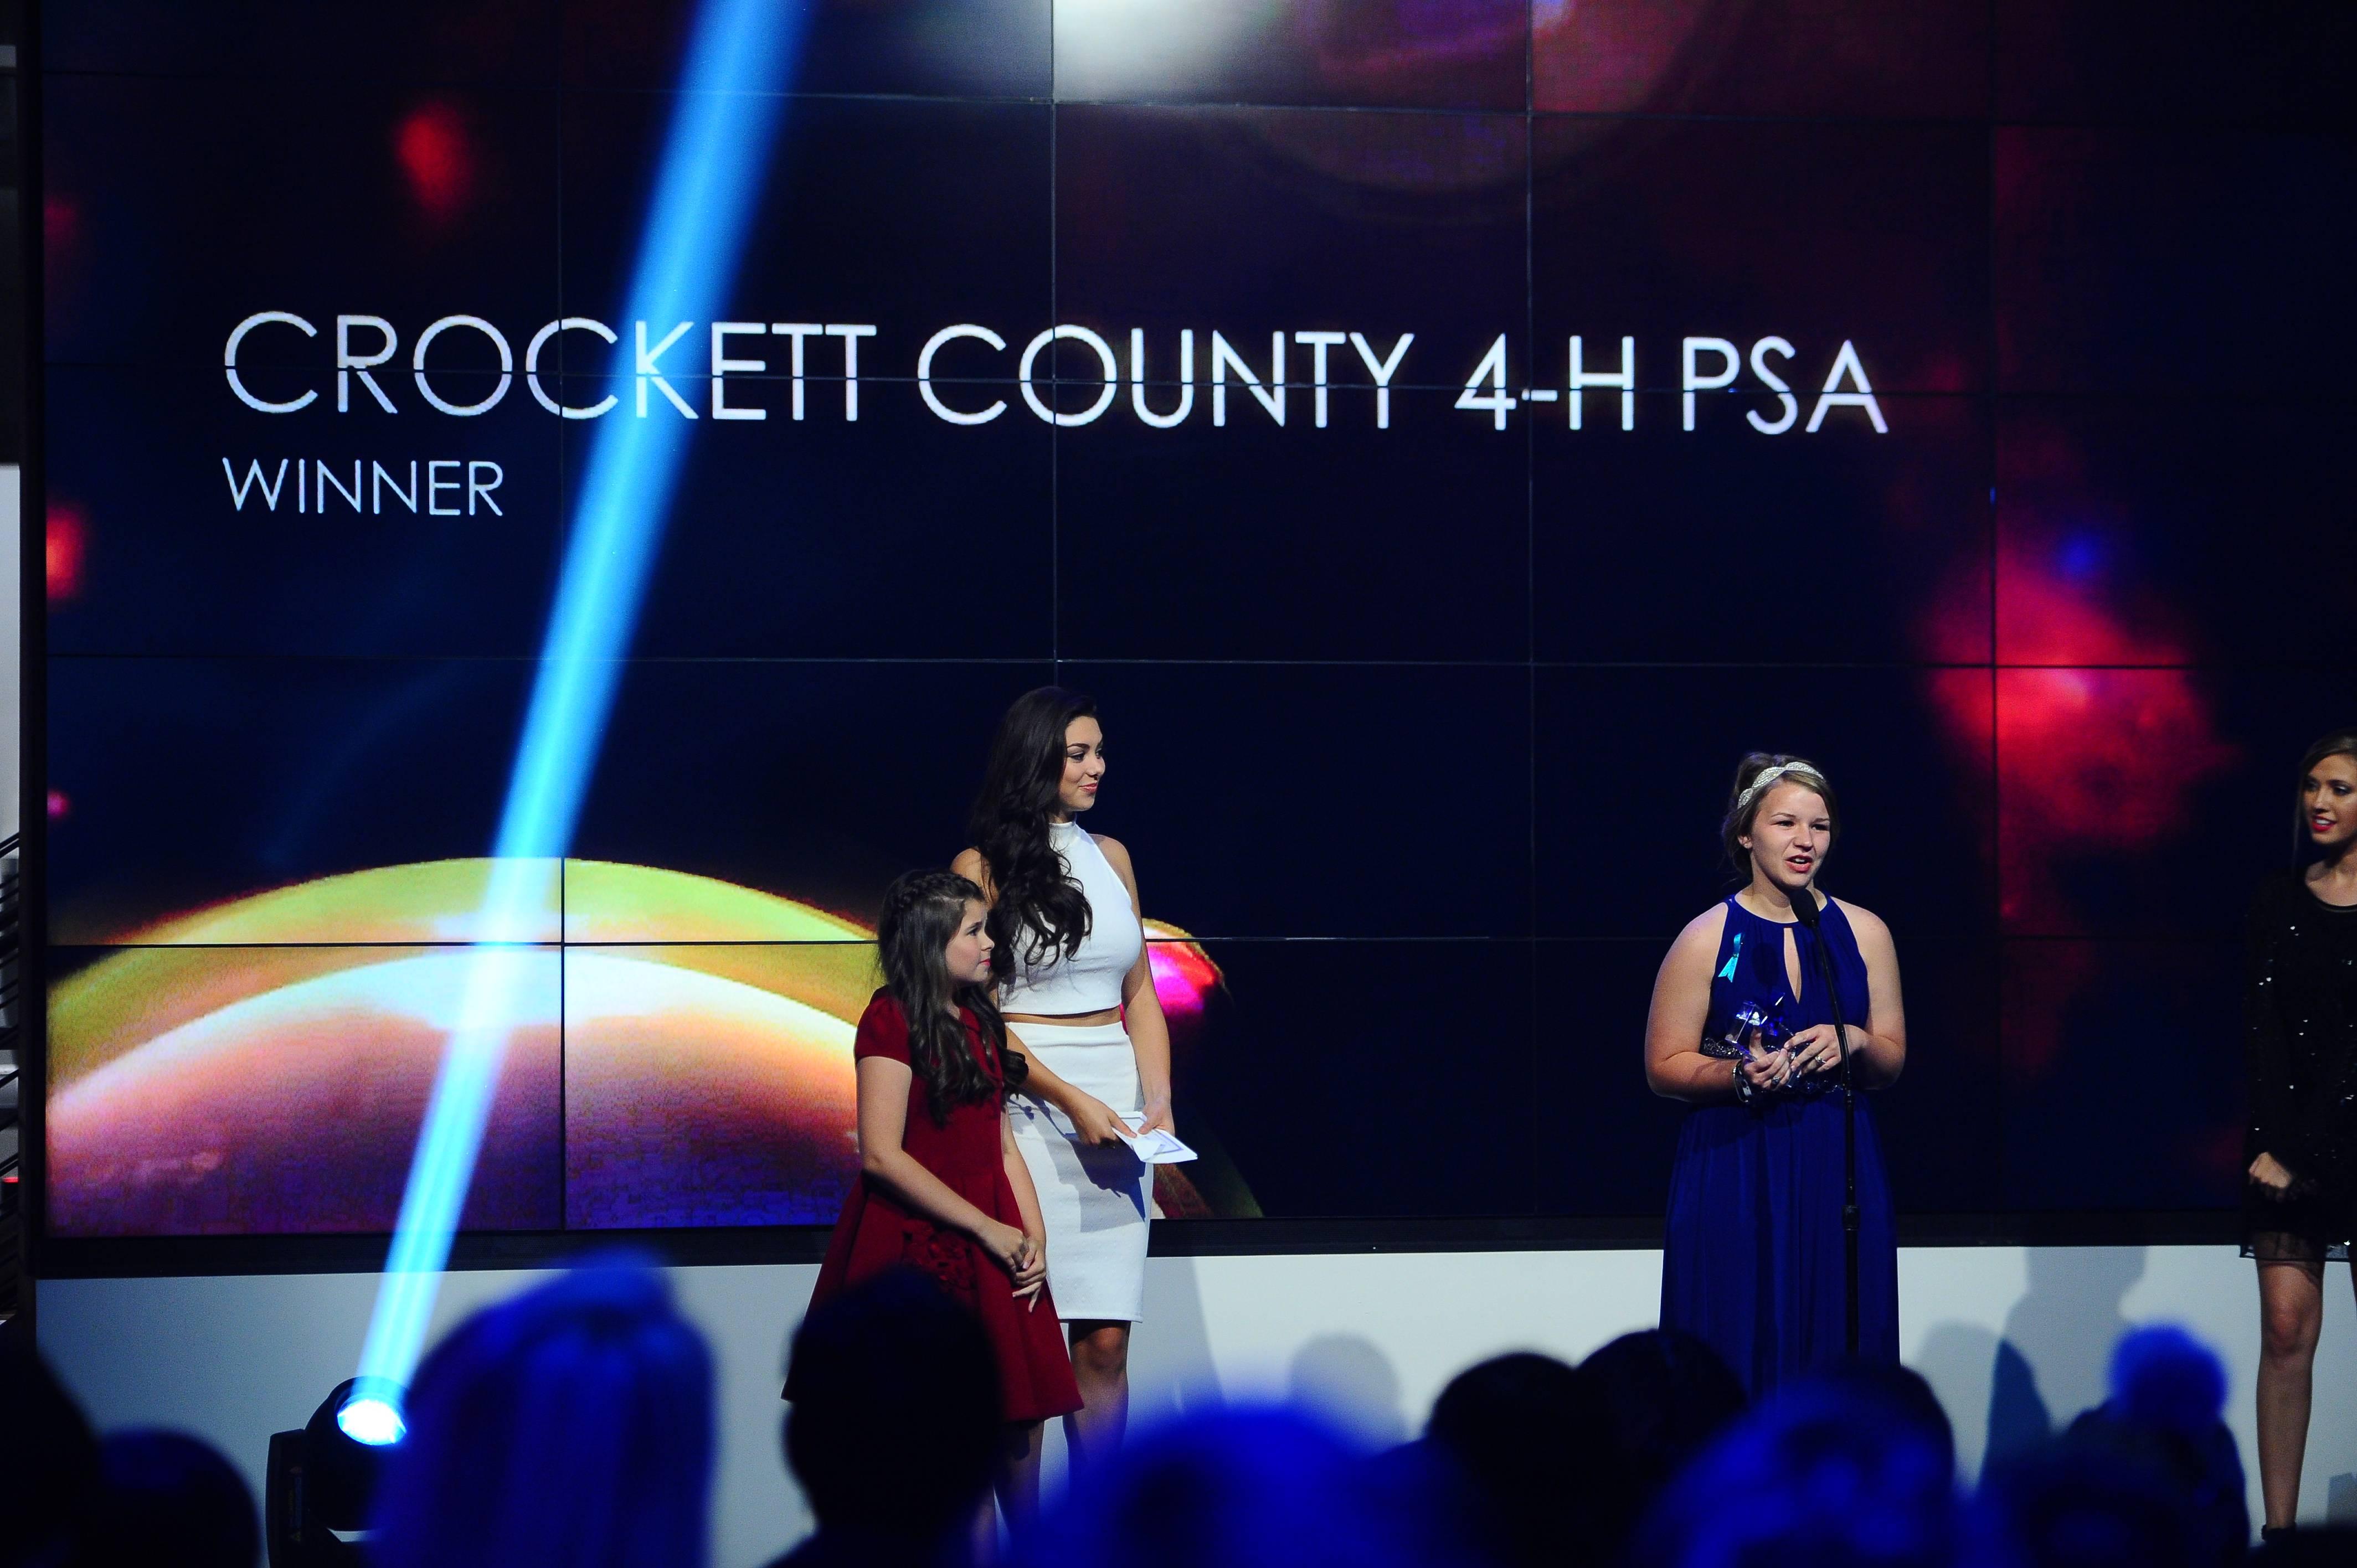 Crocket County 4-H PSA Winner